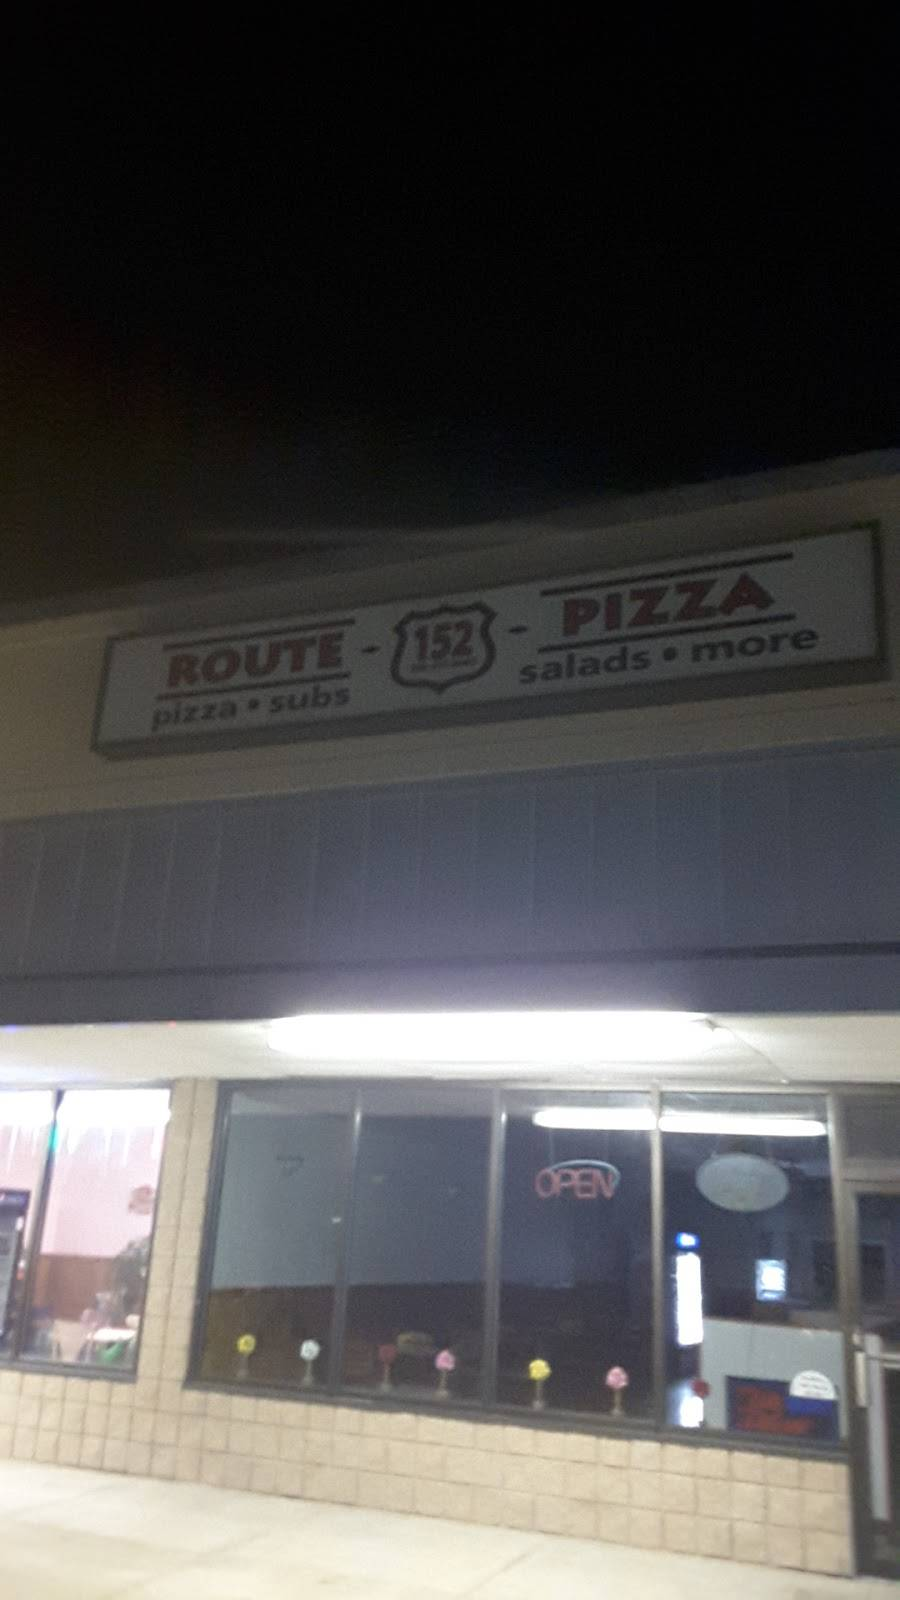 Route 152 Pizza | restaurant | 217 S Main St, Attleboro, MA 02703, USA | 5084550460 OR +1 508-455-0460